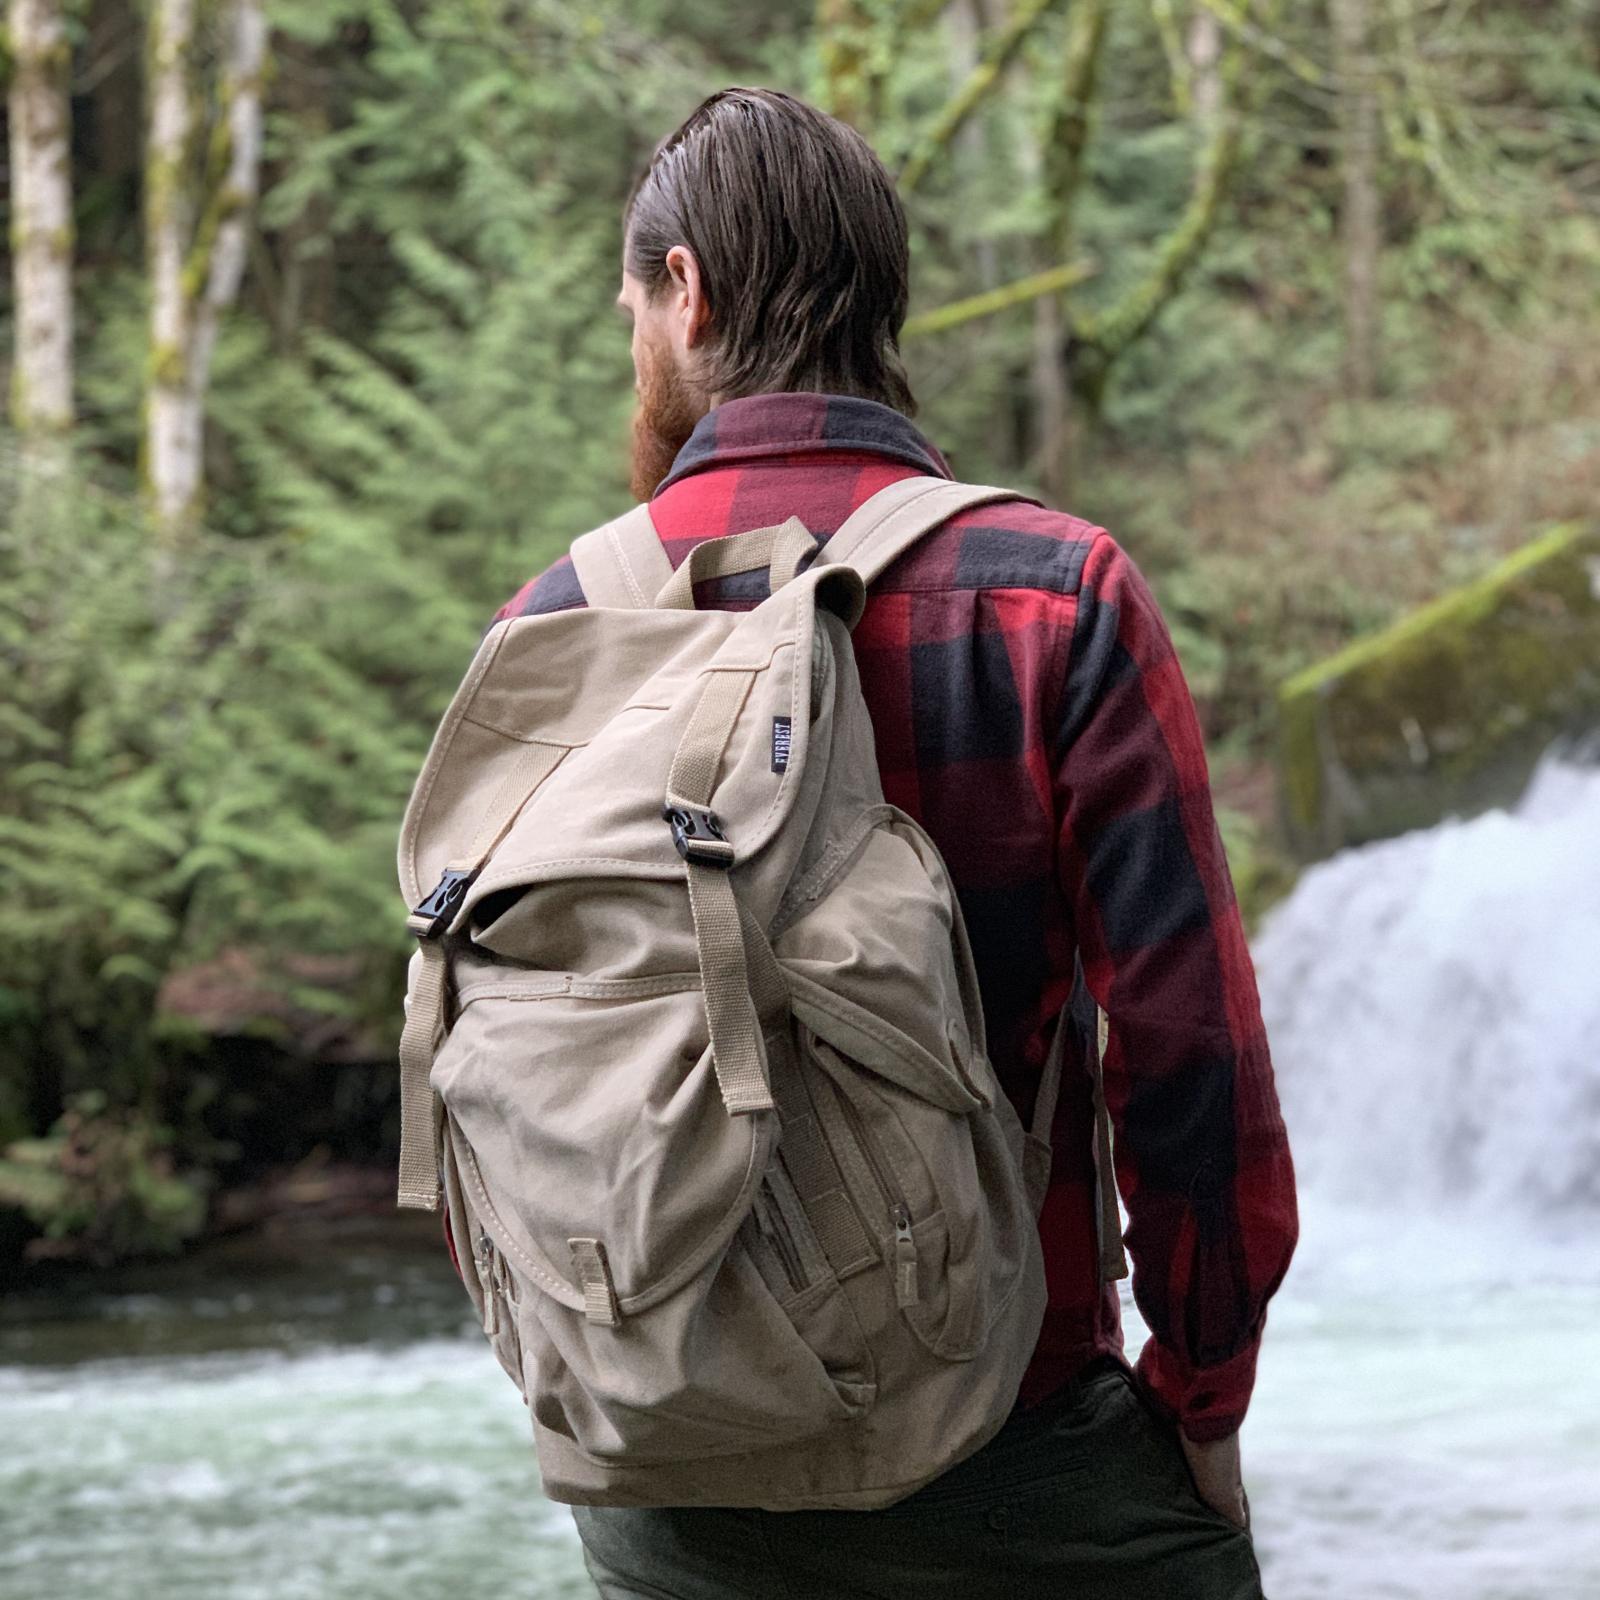 ASR Outdoor Deluxe Aluminum Folding Sluice Box Backpack Kit for Gold Prospecting